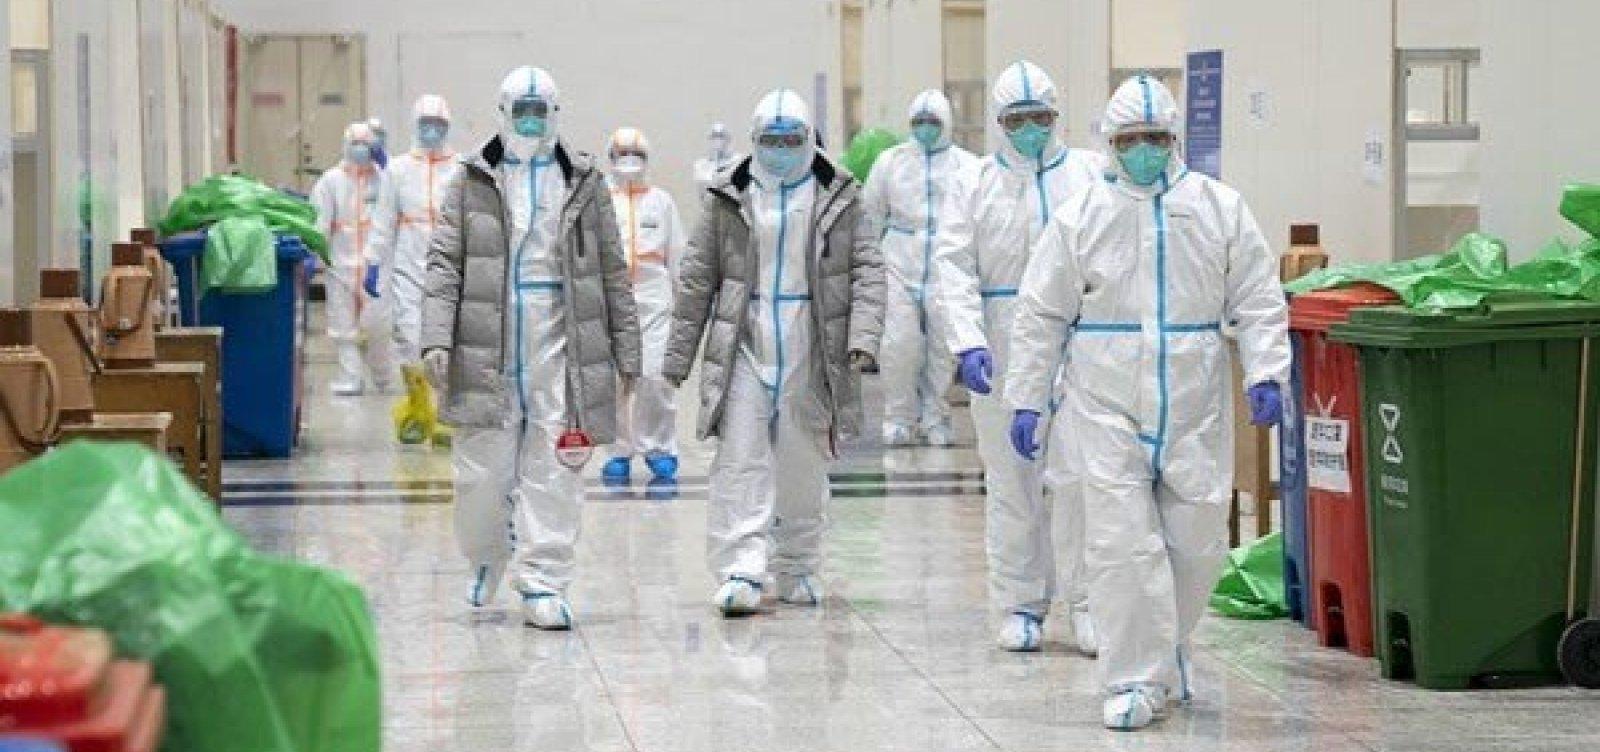 [Número de mortos por coronavírus na China passa de mil]